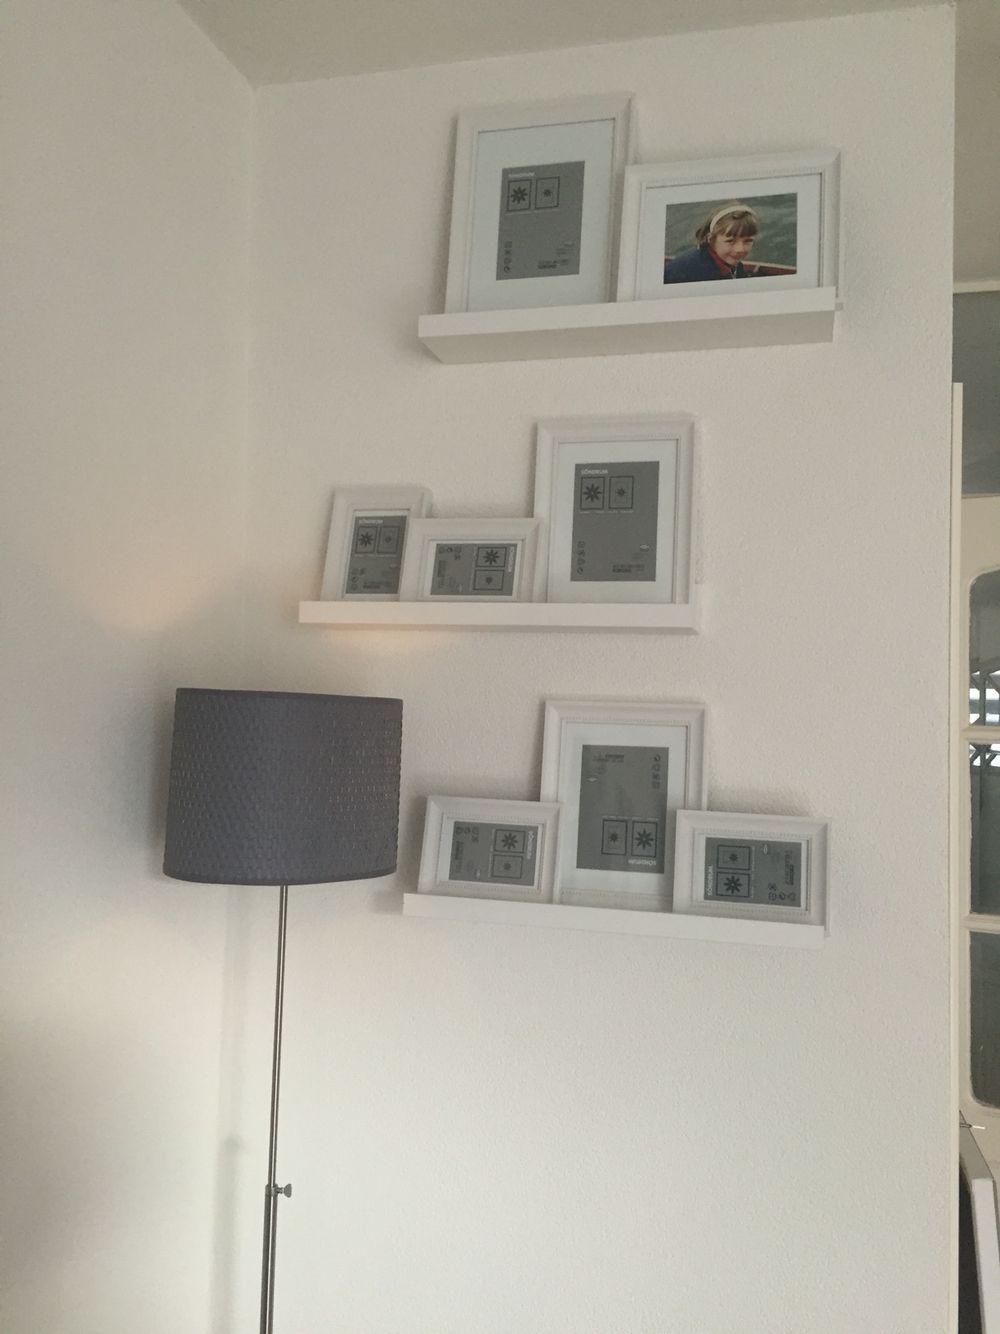 Fotowand Ikea fotowand mosslanda en söndrum de ikea nu nog persoonlijk maken